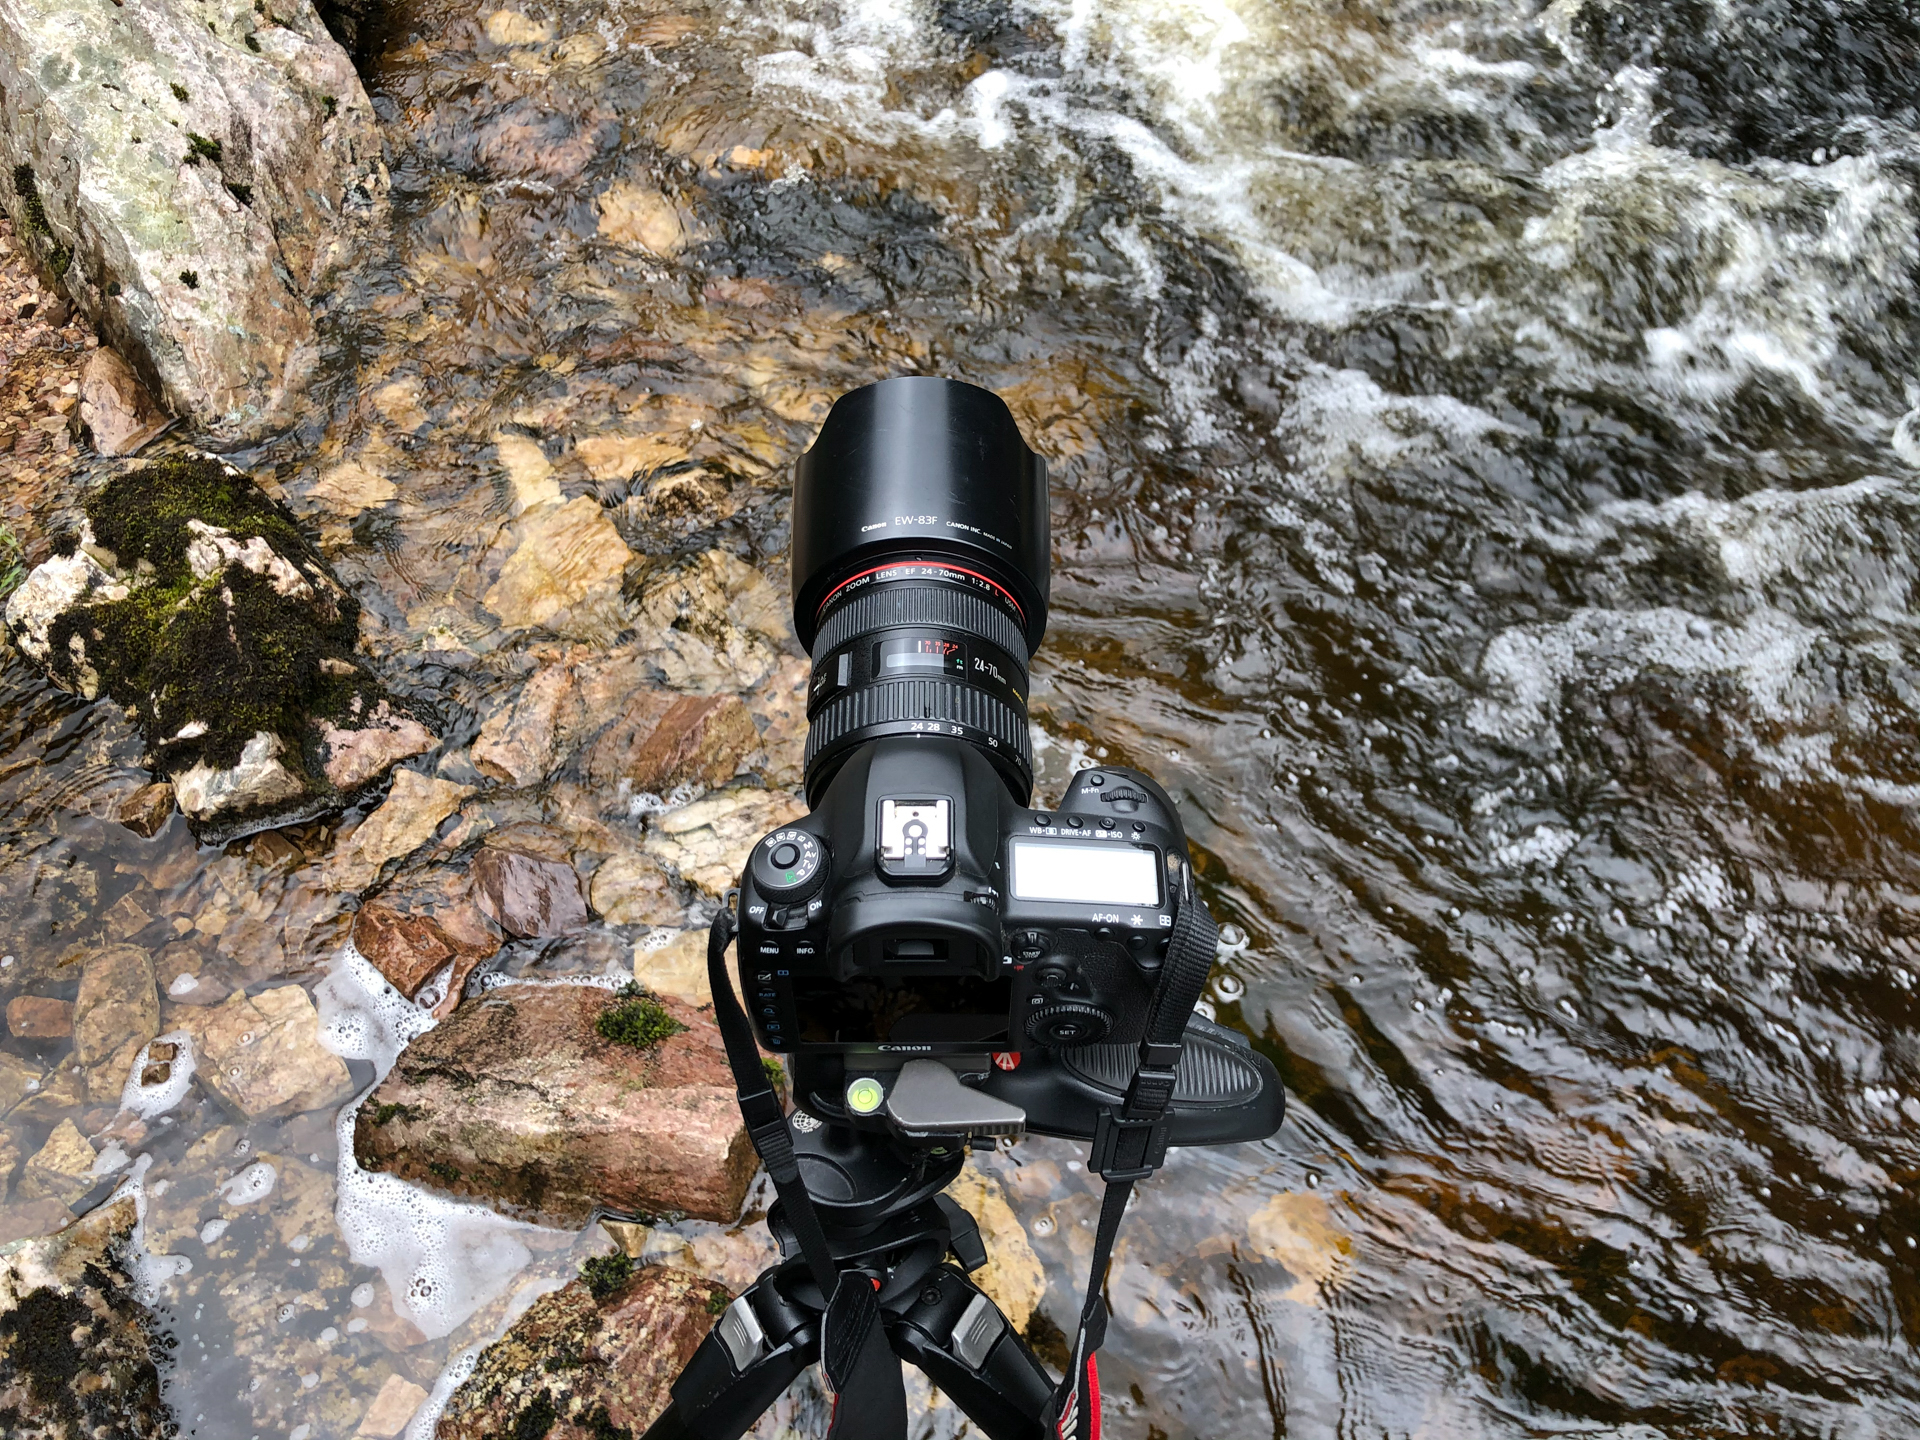 Camera perched on a tripod in a stream